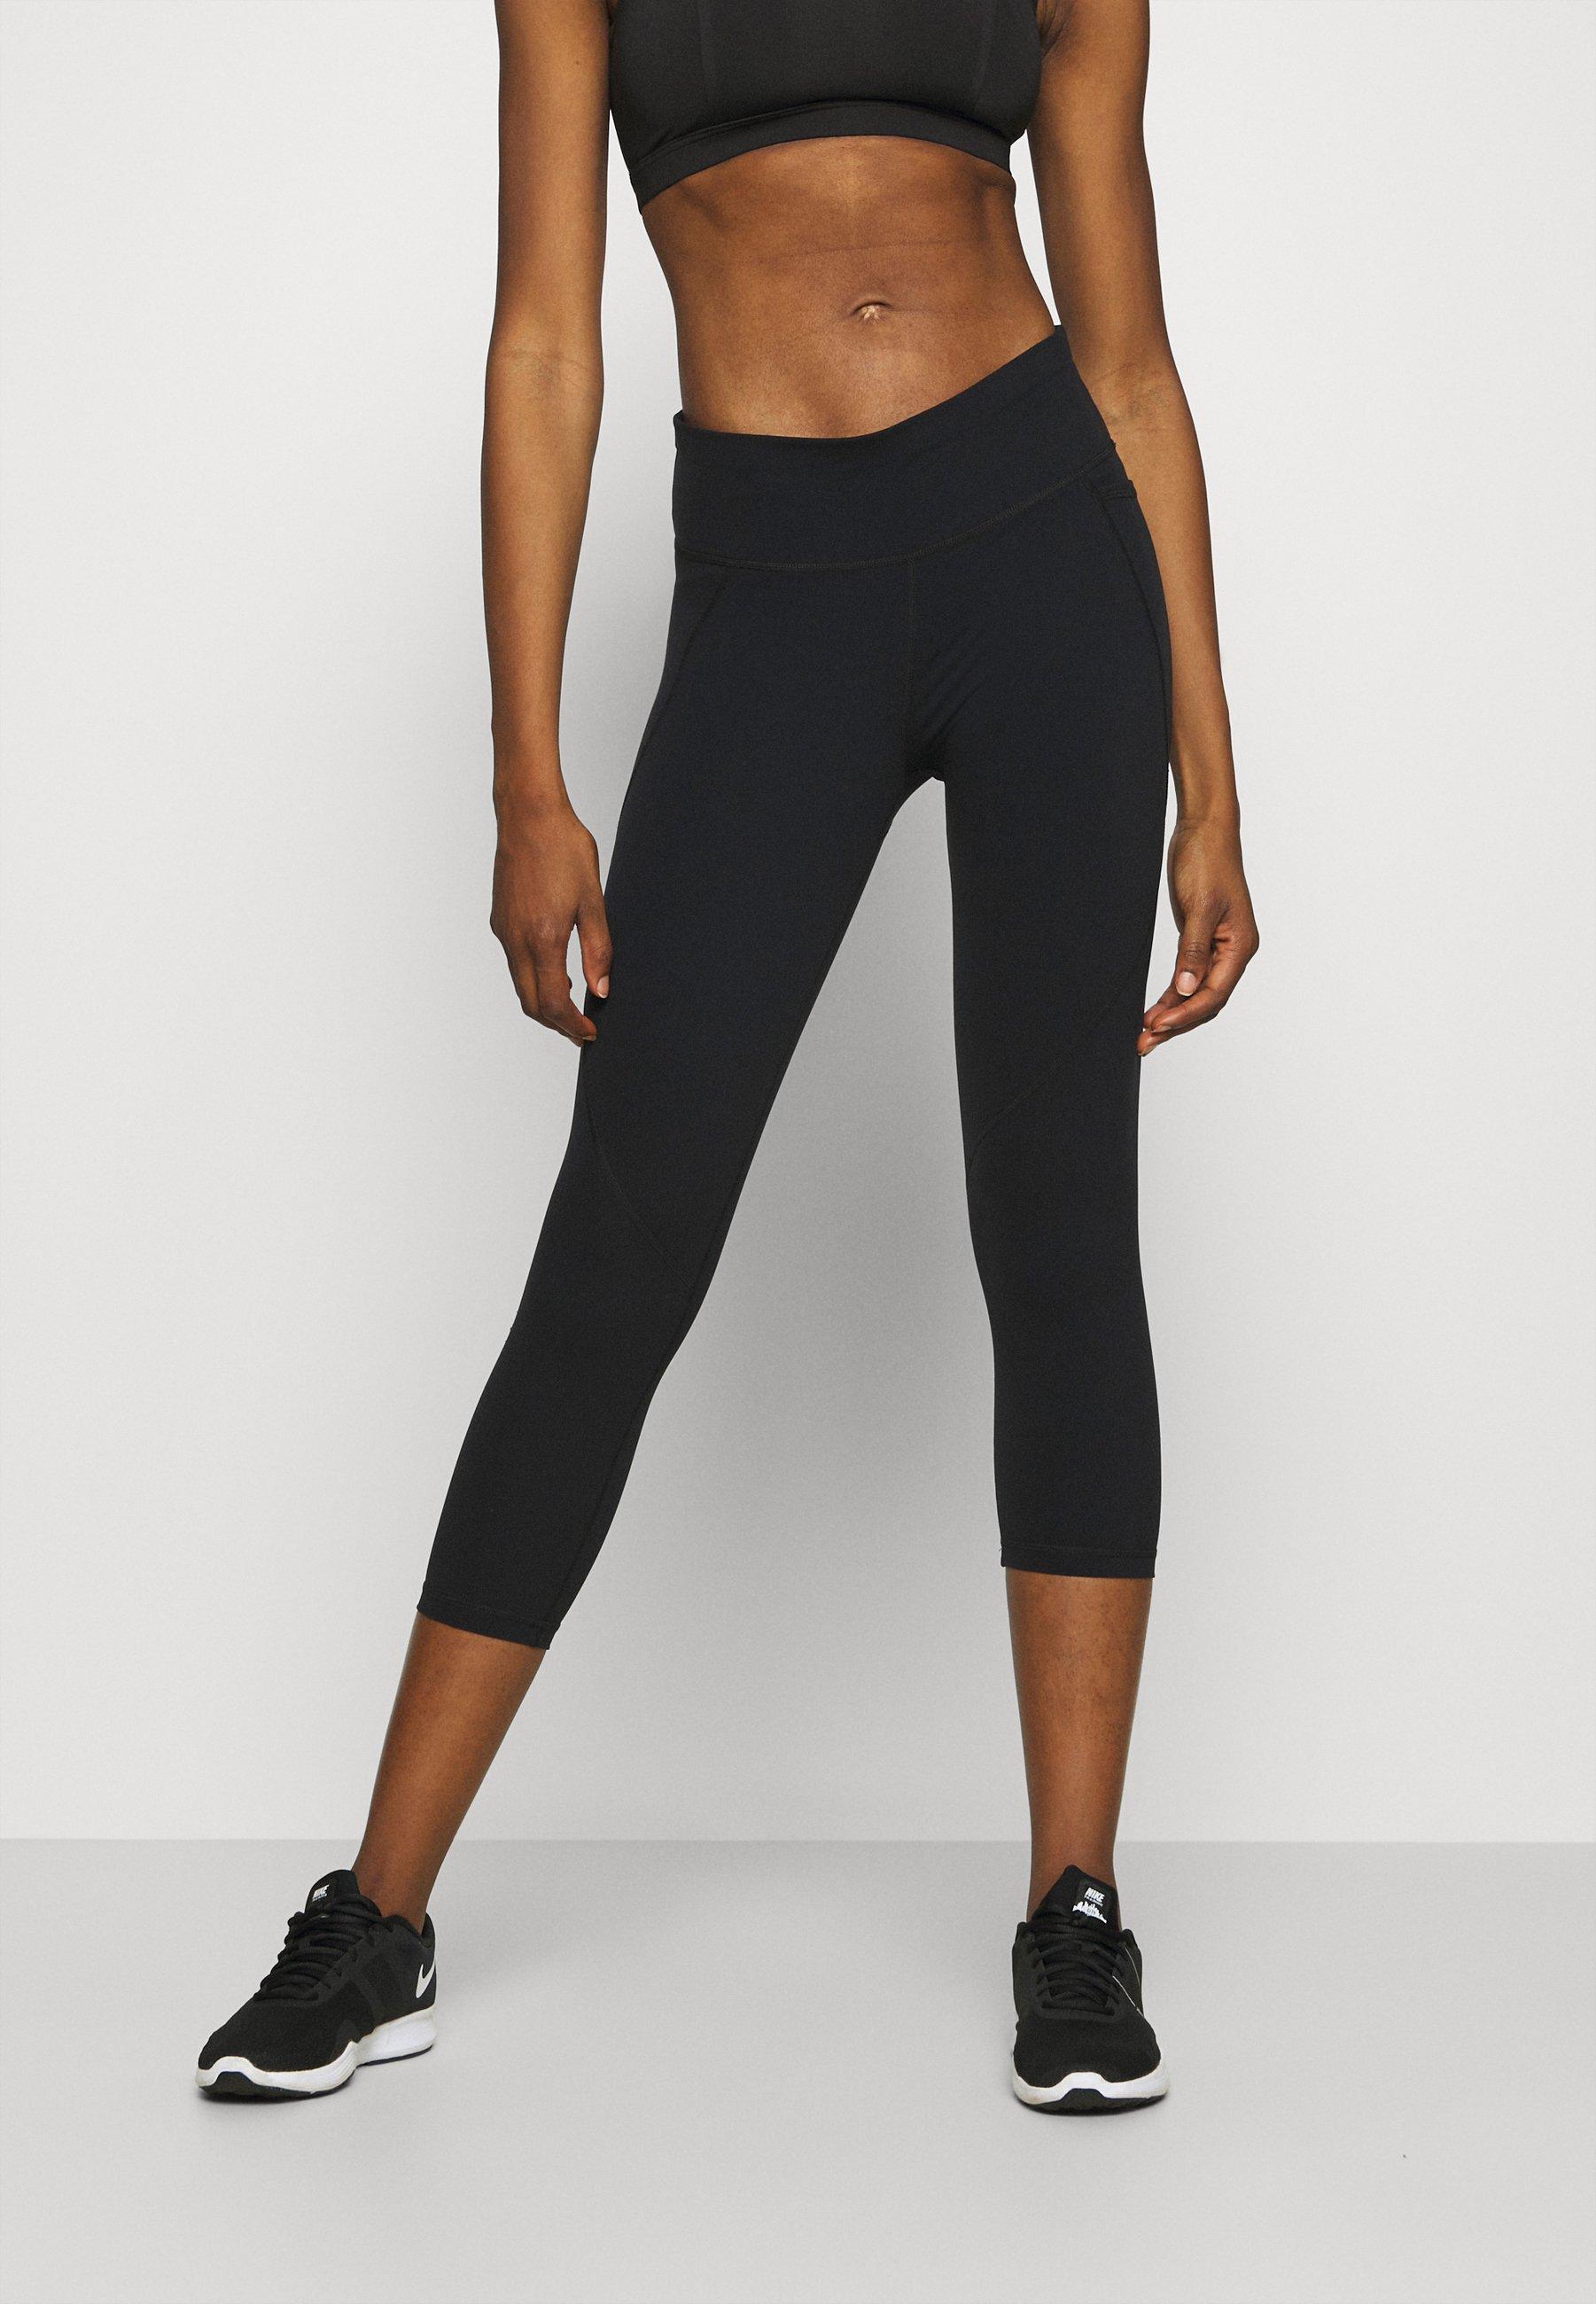 Femme POWER CROP WORKOUT LEGGINGS - Collants